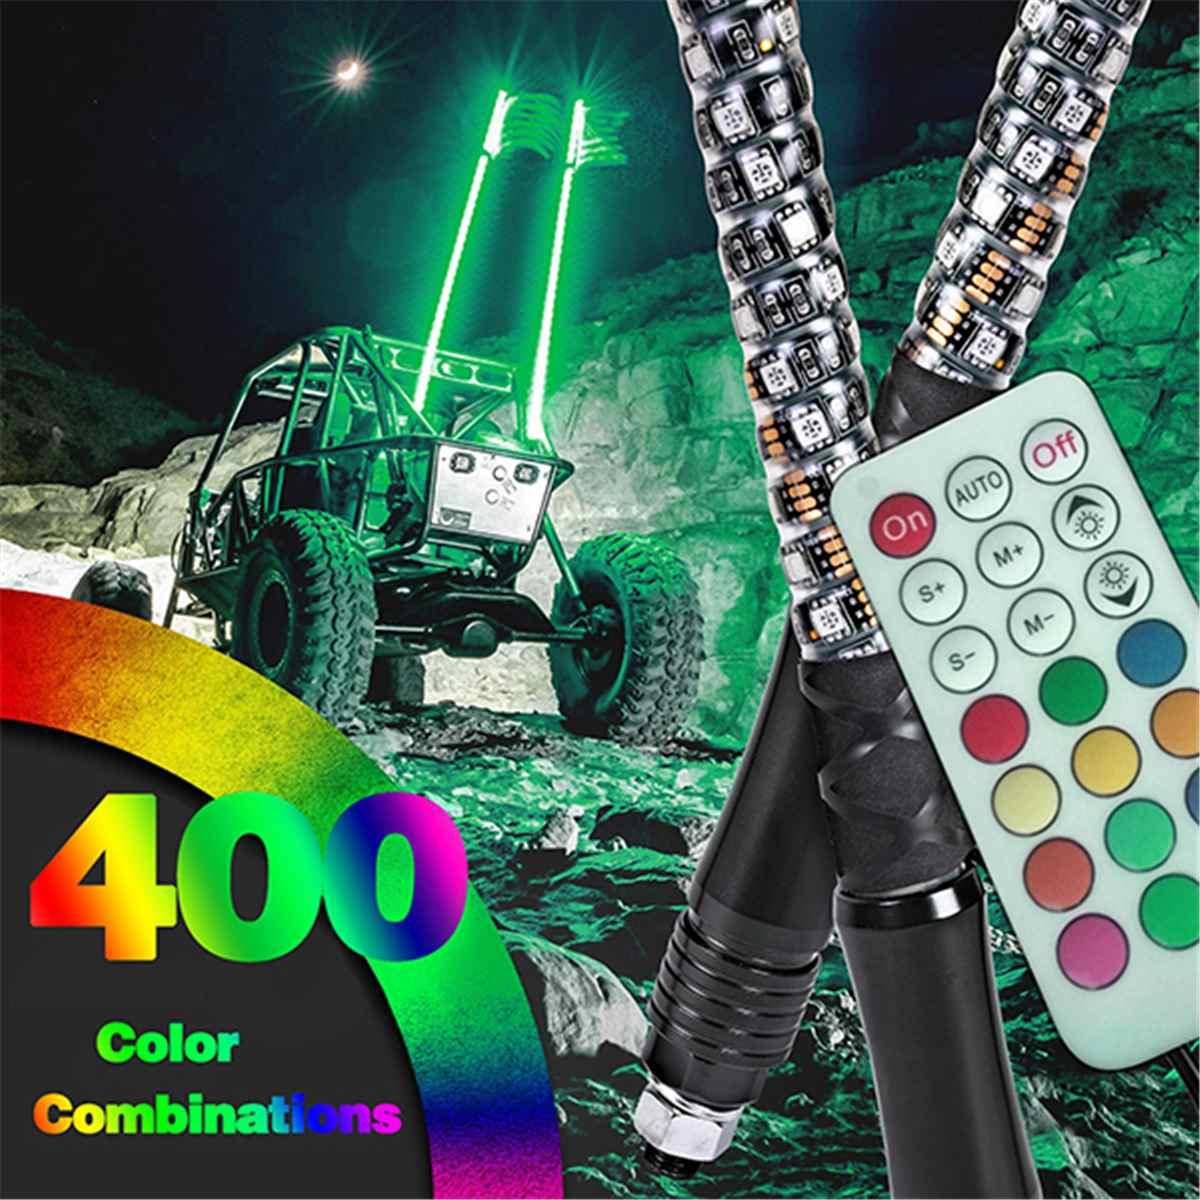 3/4/5FT LED Whip Light RGB Waterproof Bendable Remote Control Multi-color Super Bright Flagpole Lamp Light For SUV ATV UTV RZR